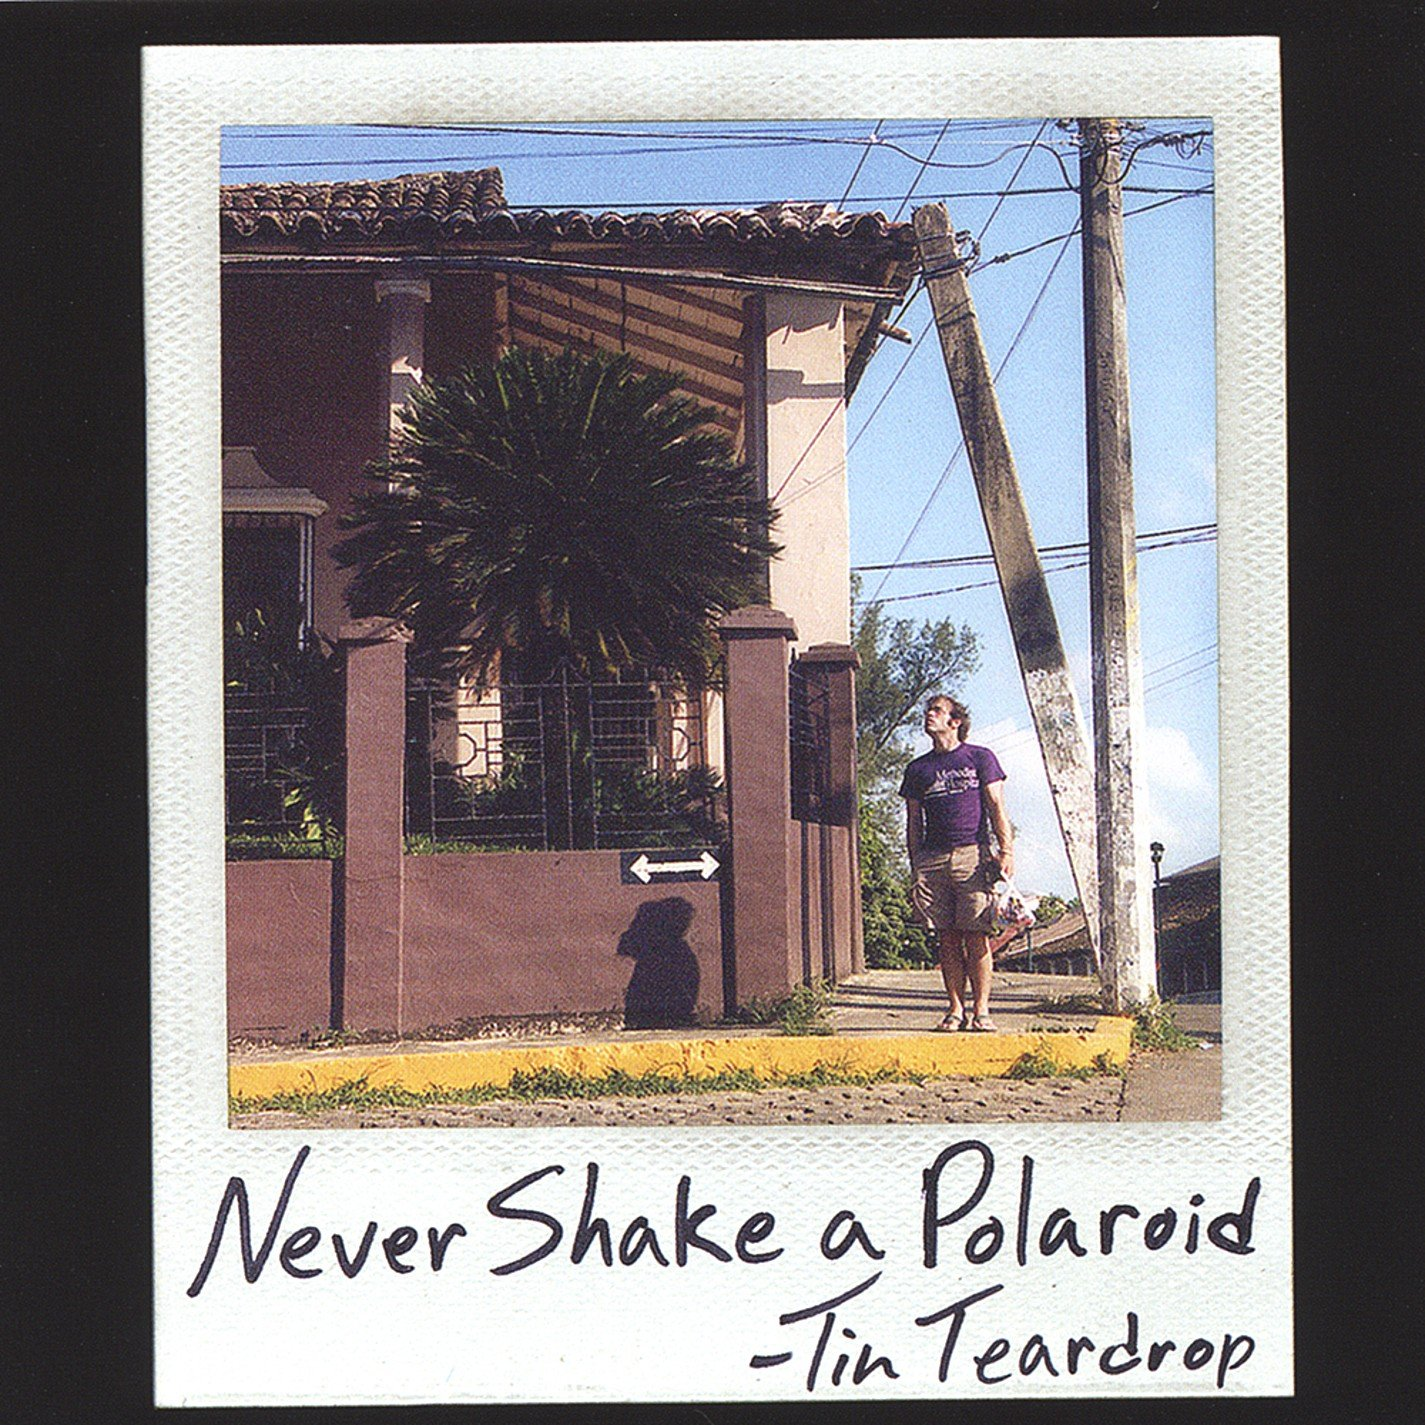 Never Shake a Polaroid Max 51% OFF Max 61% OFF